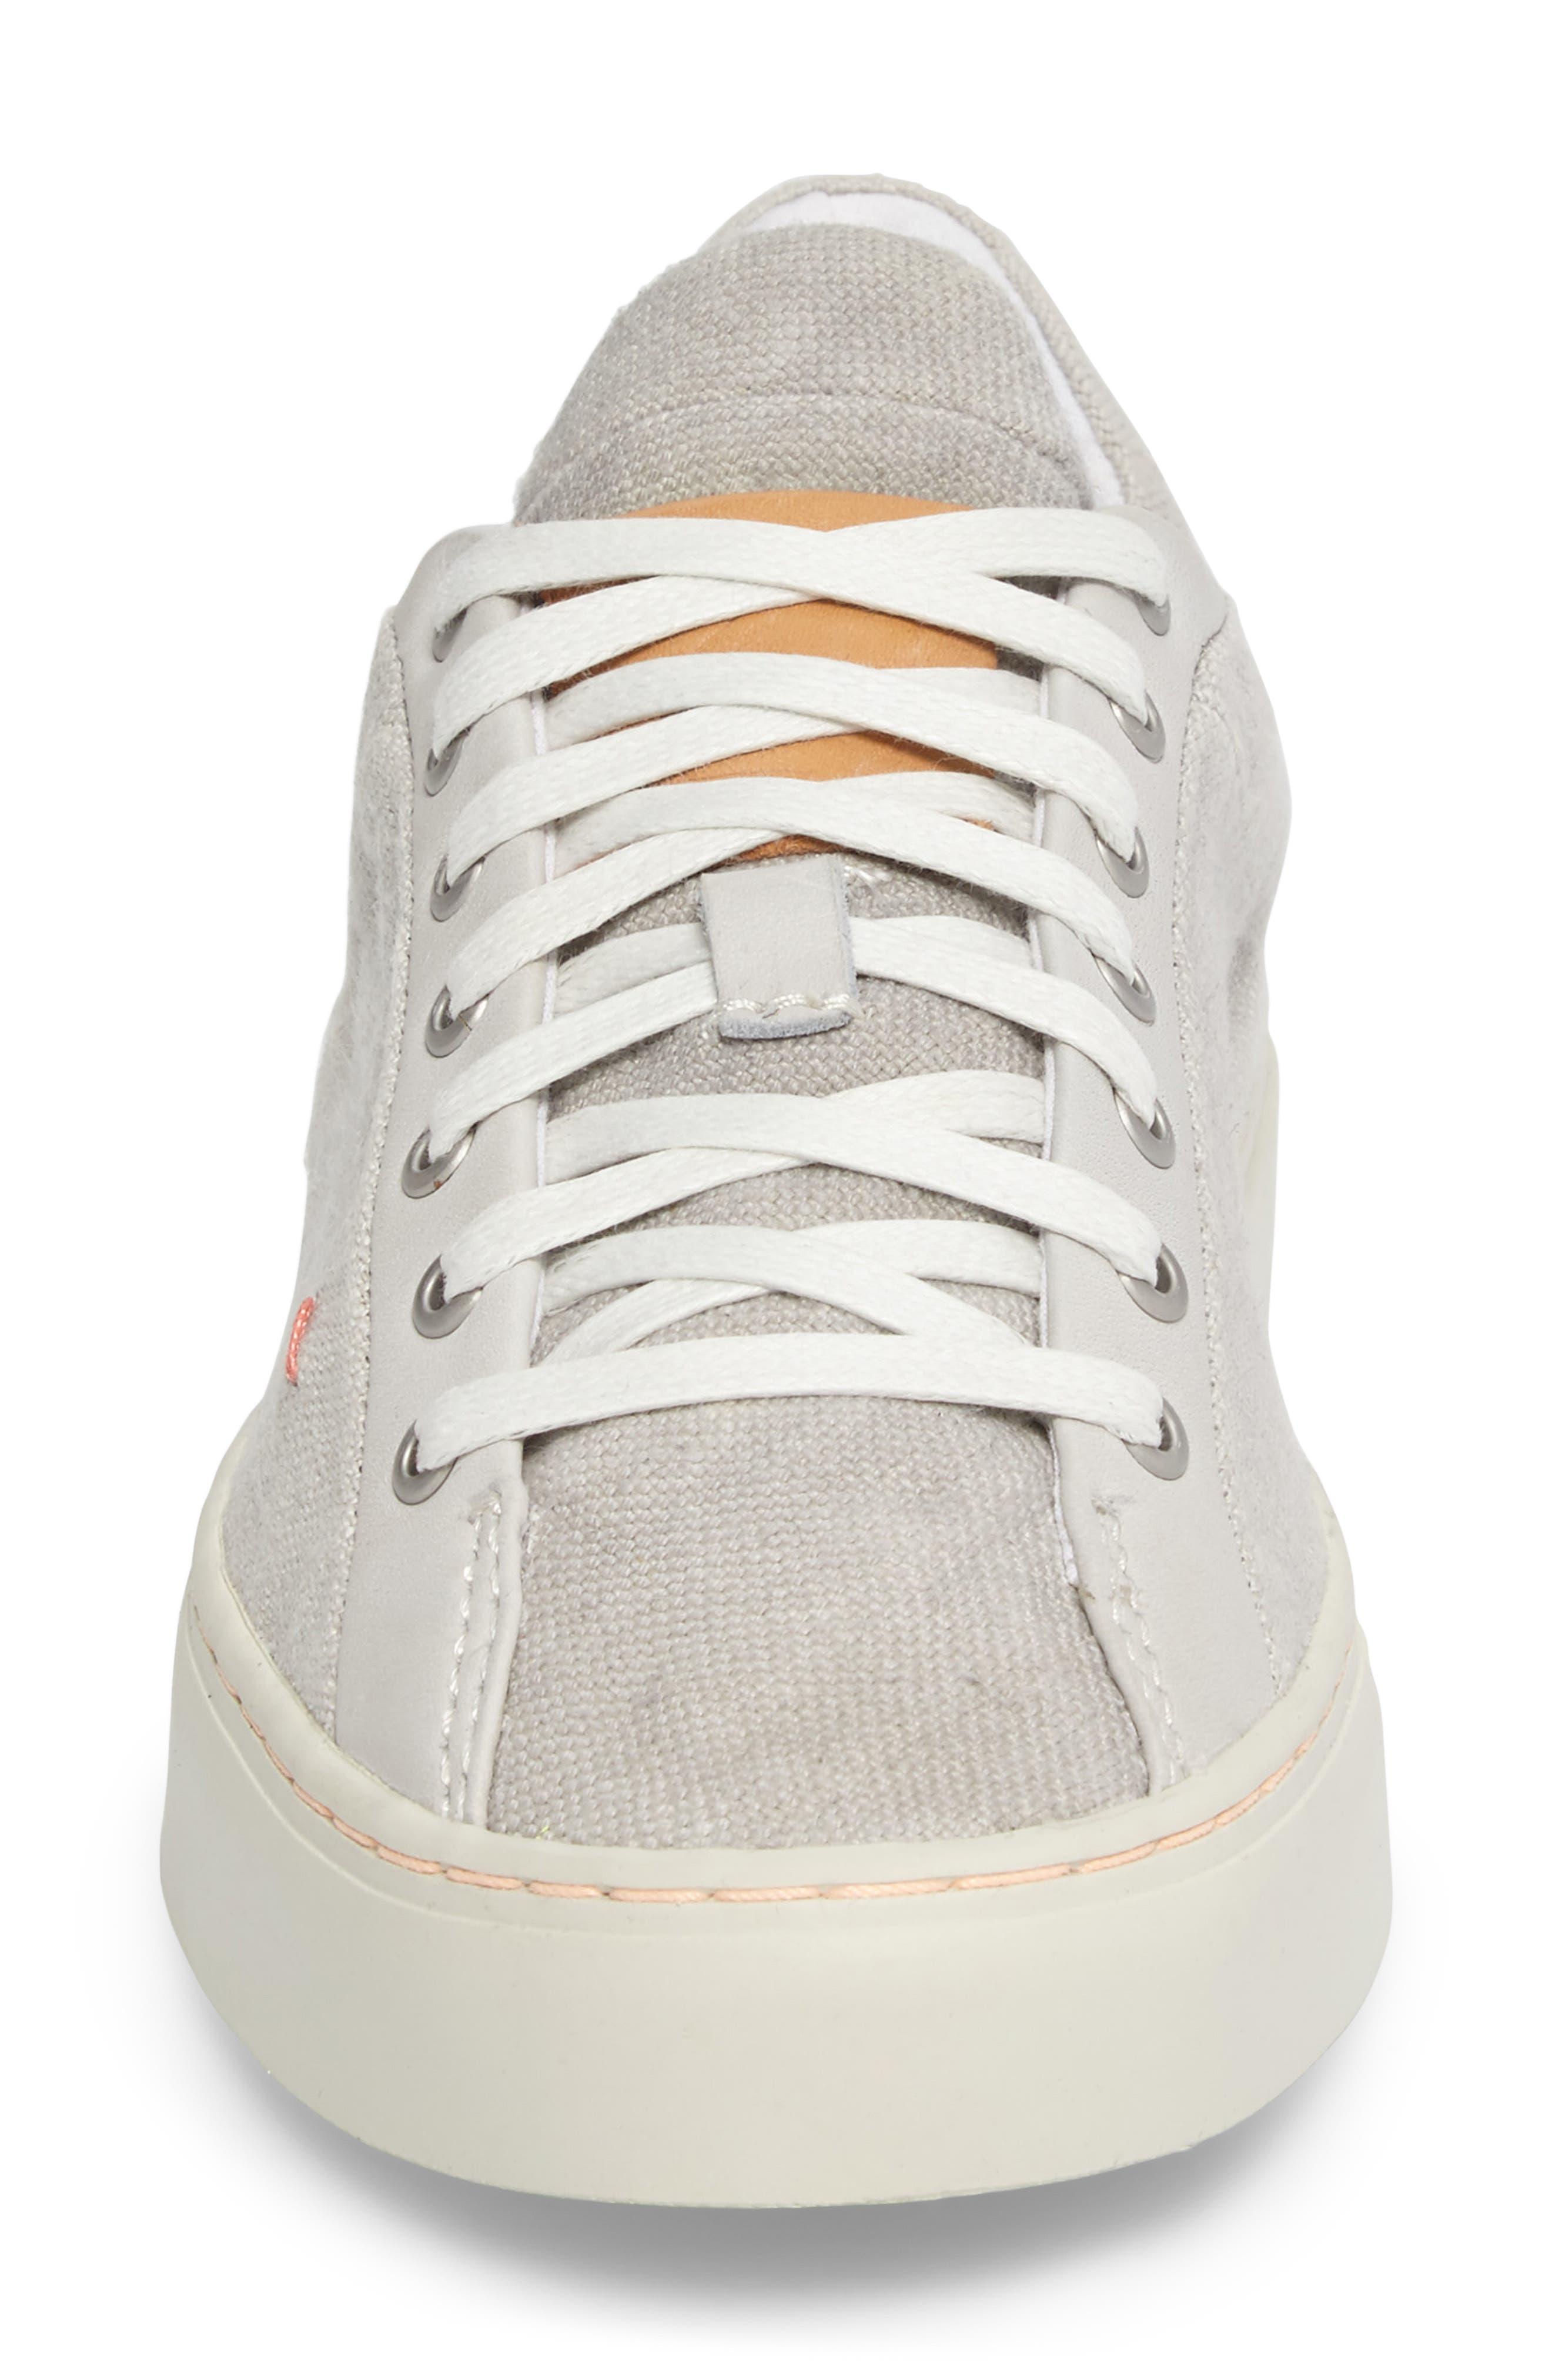 Somerville Sneaker,                             Alternate thumbnail 4, color,                             CONCRETE FABRIC